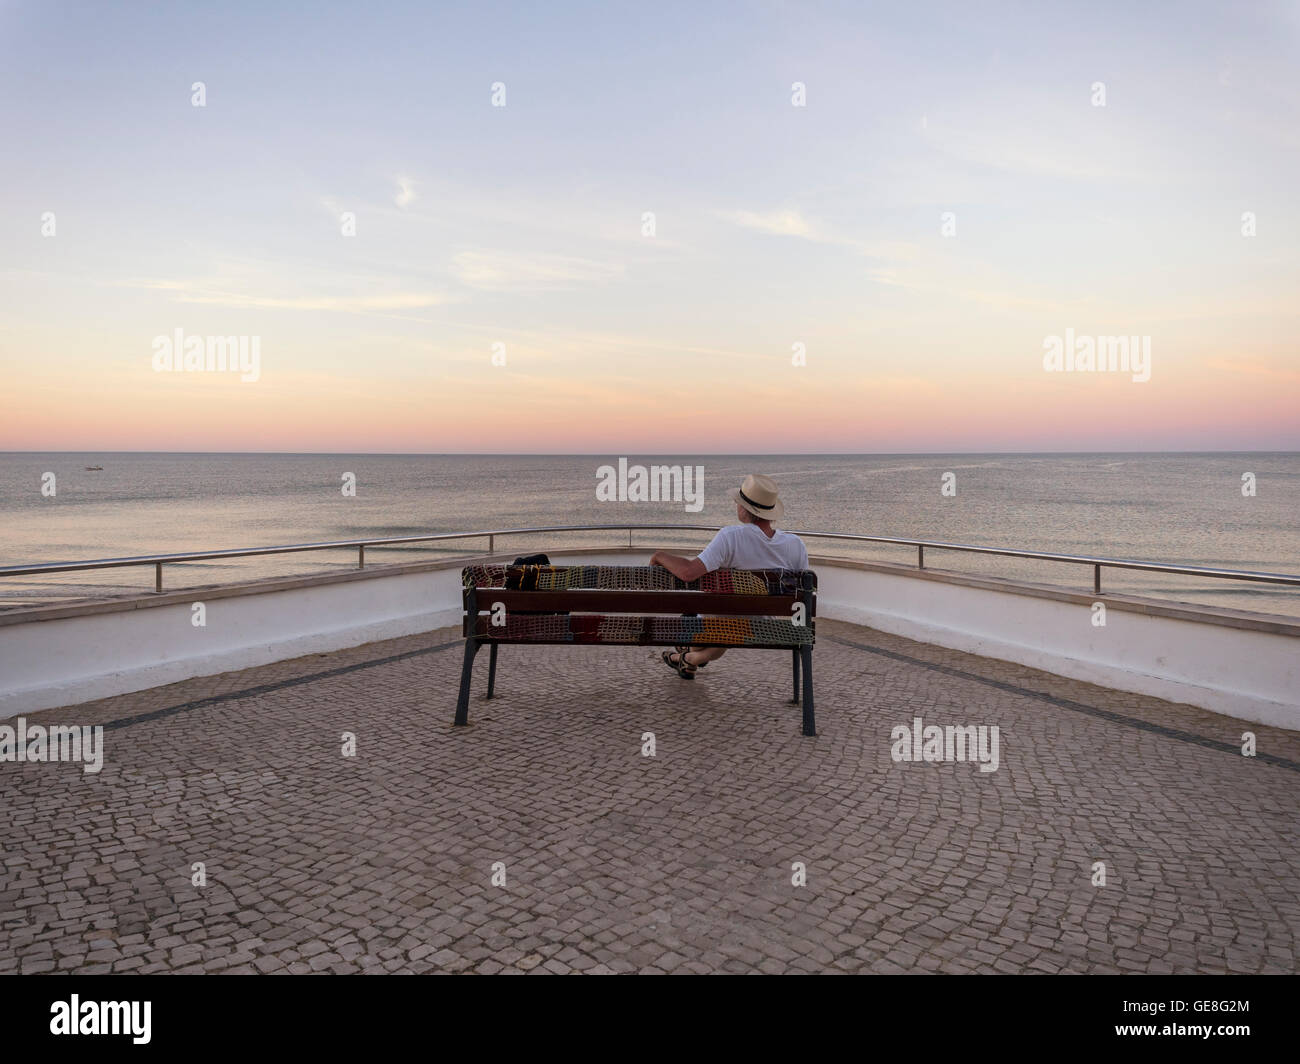 Portugal, Senior man siting on bench watching sunrise - Stock Image